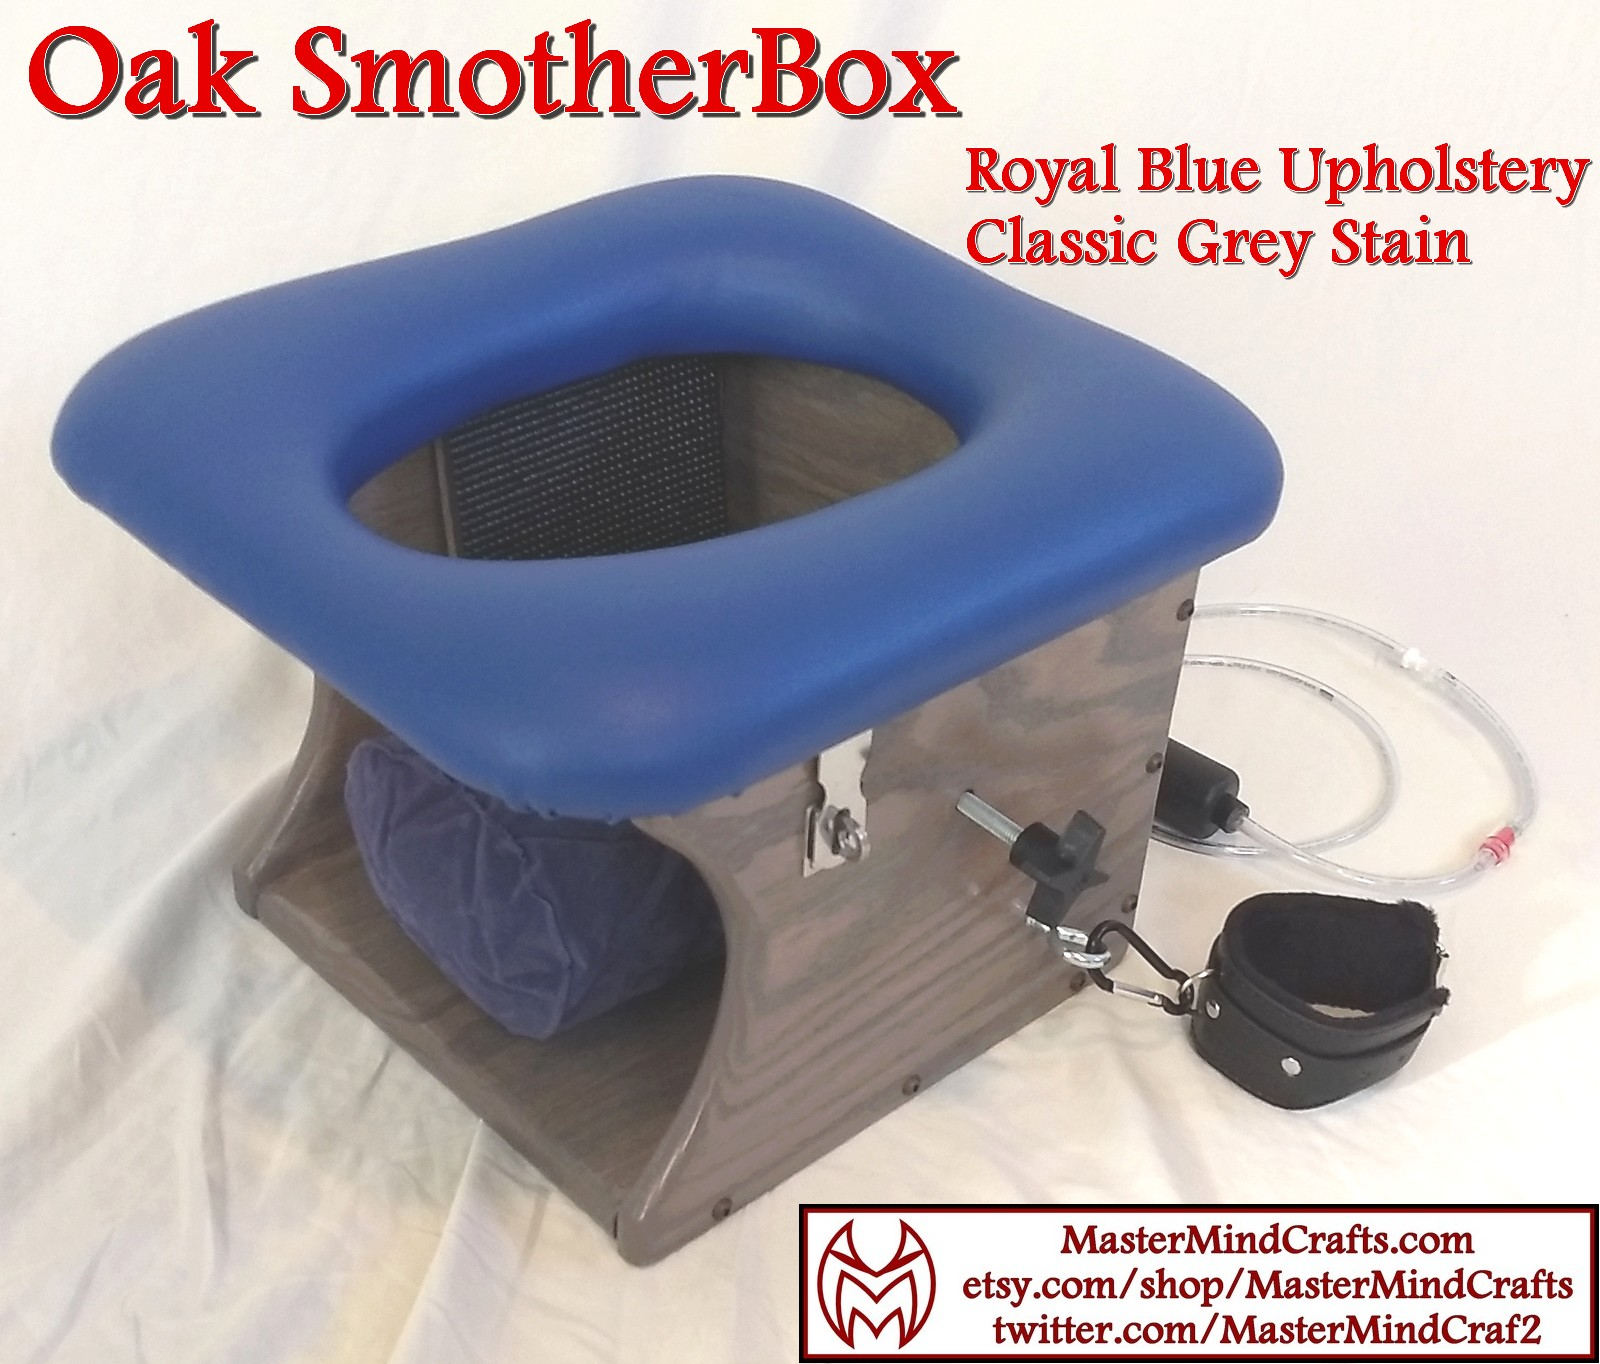 Oak SmotherBox Grey Royal BLue 4